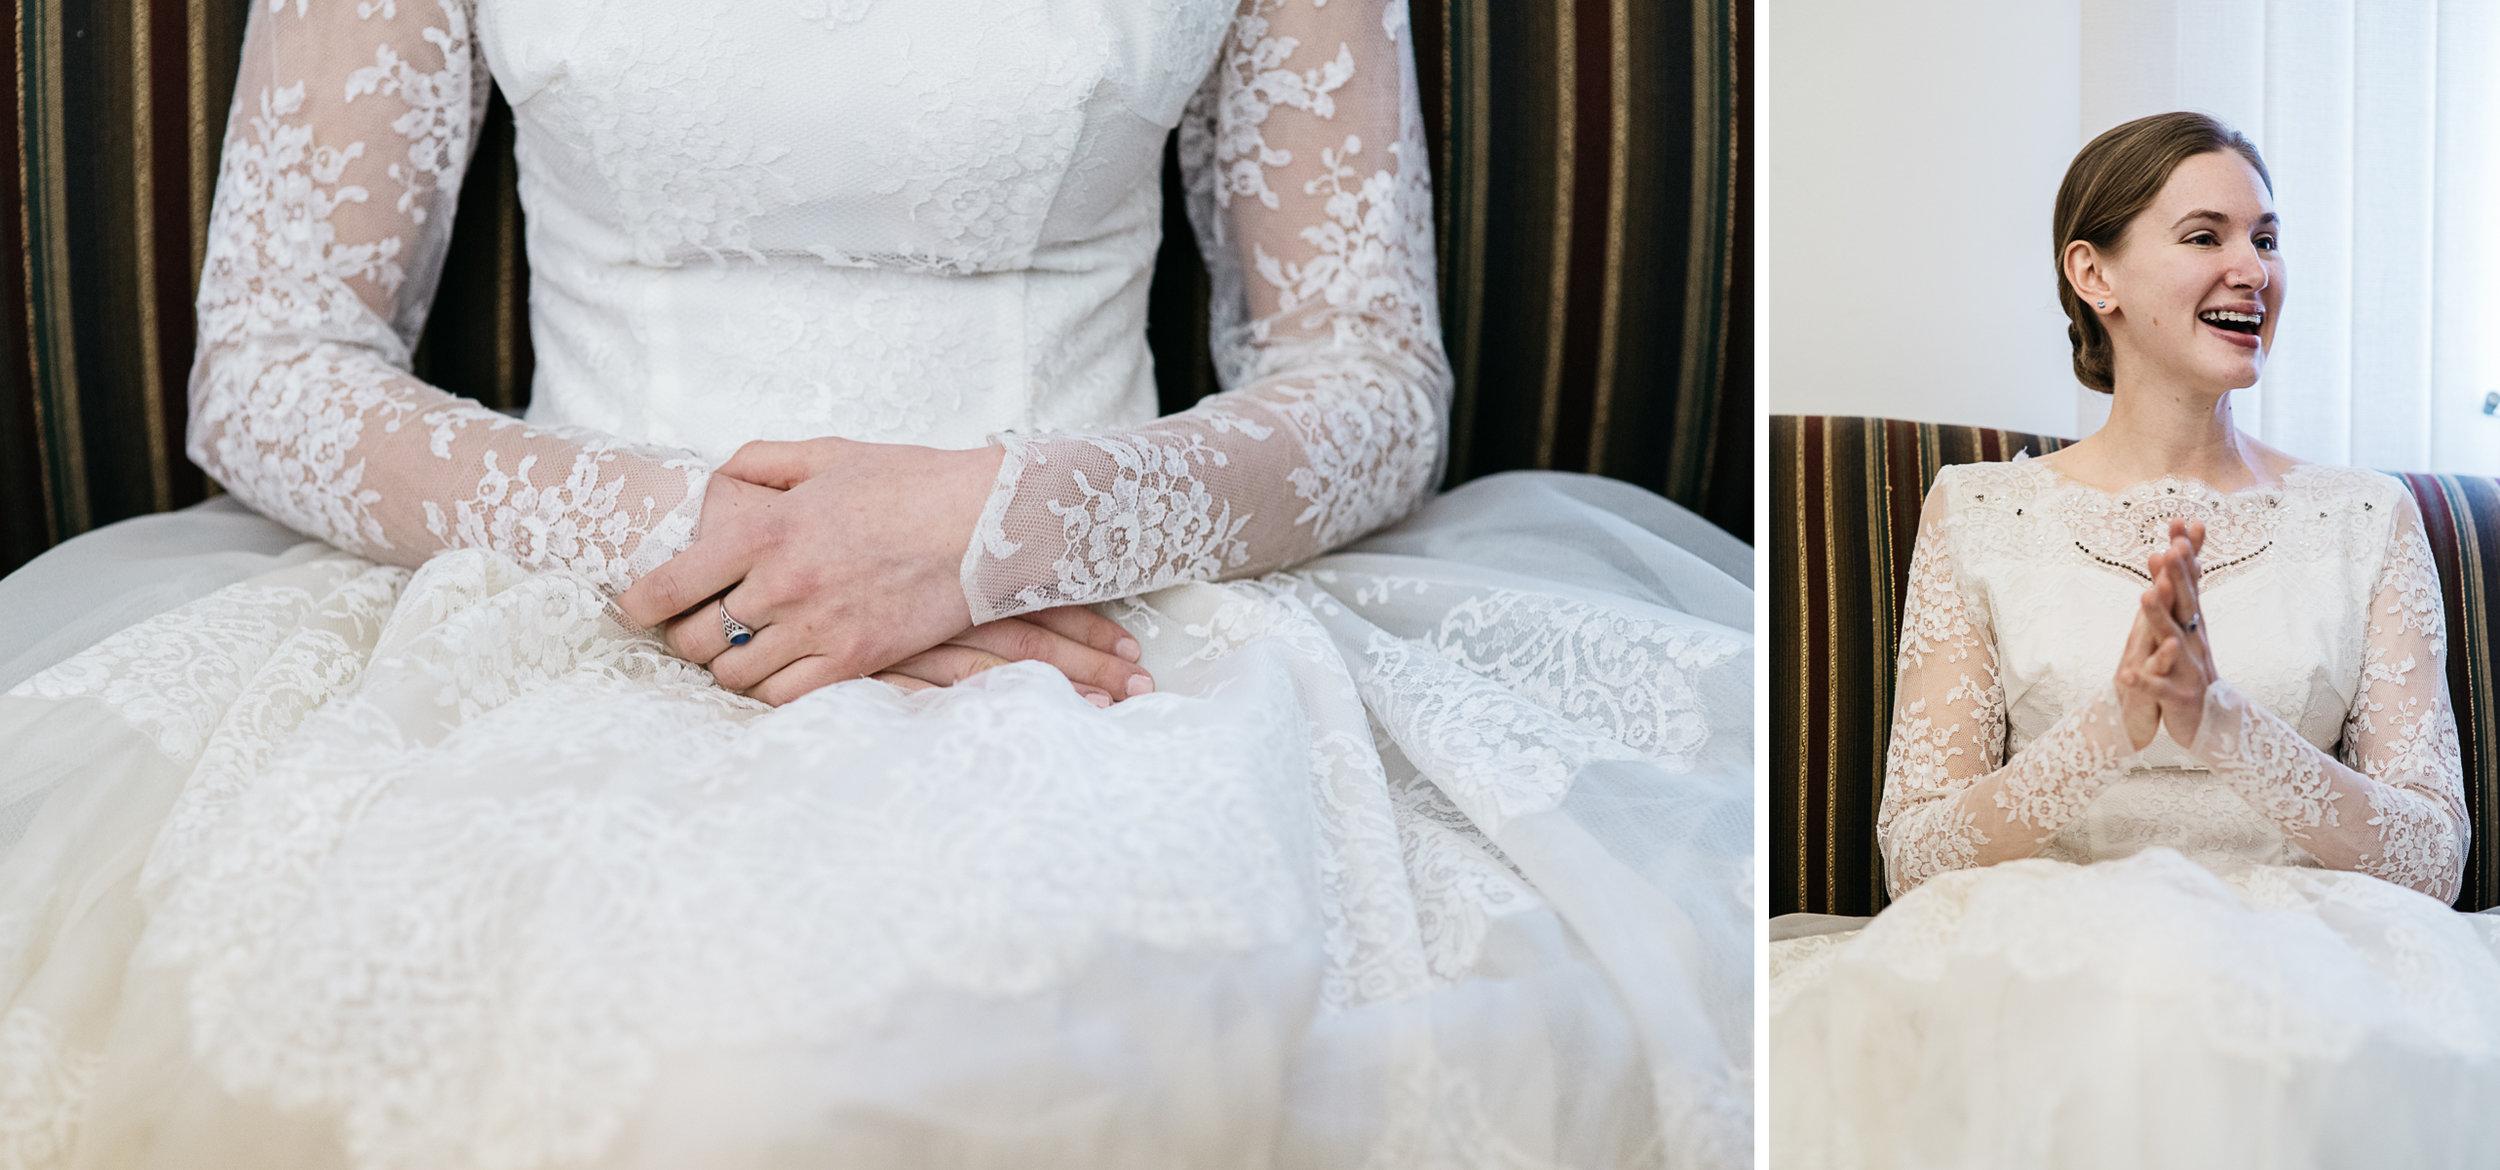 Ligonier Wedding Photography, wedding photographer Mariah Fisher.jpg